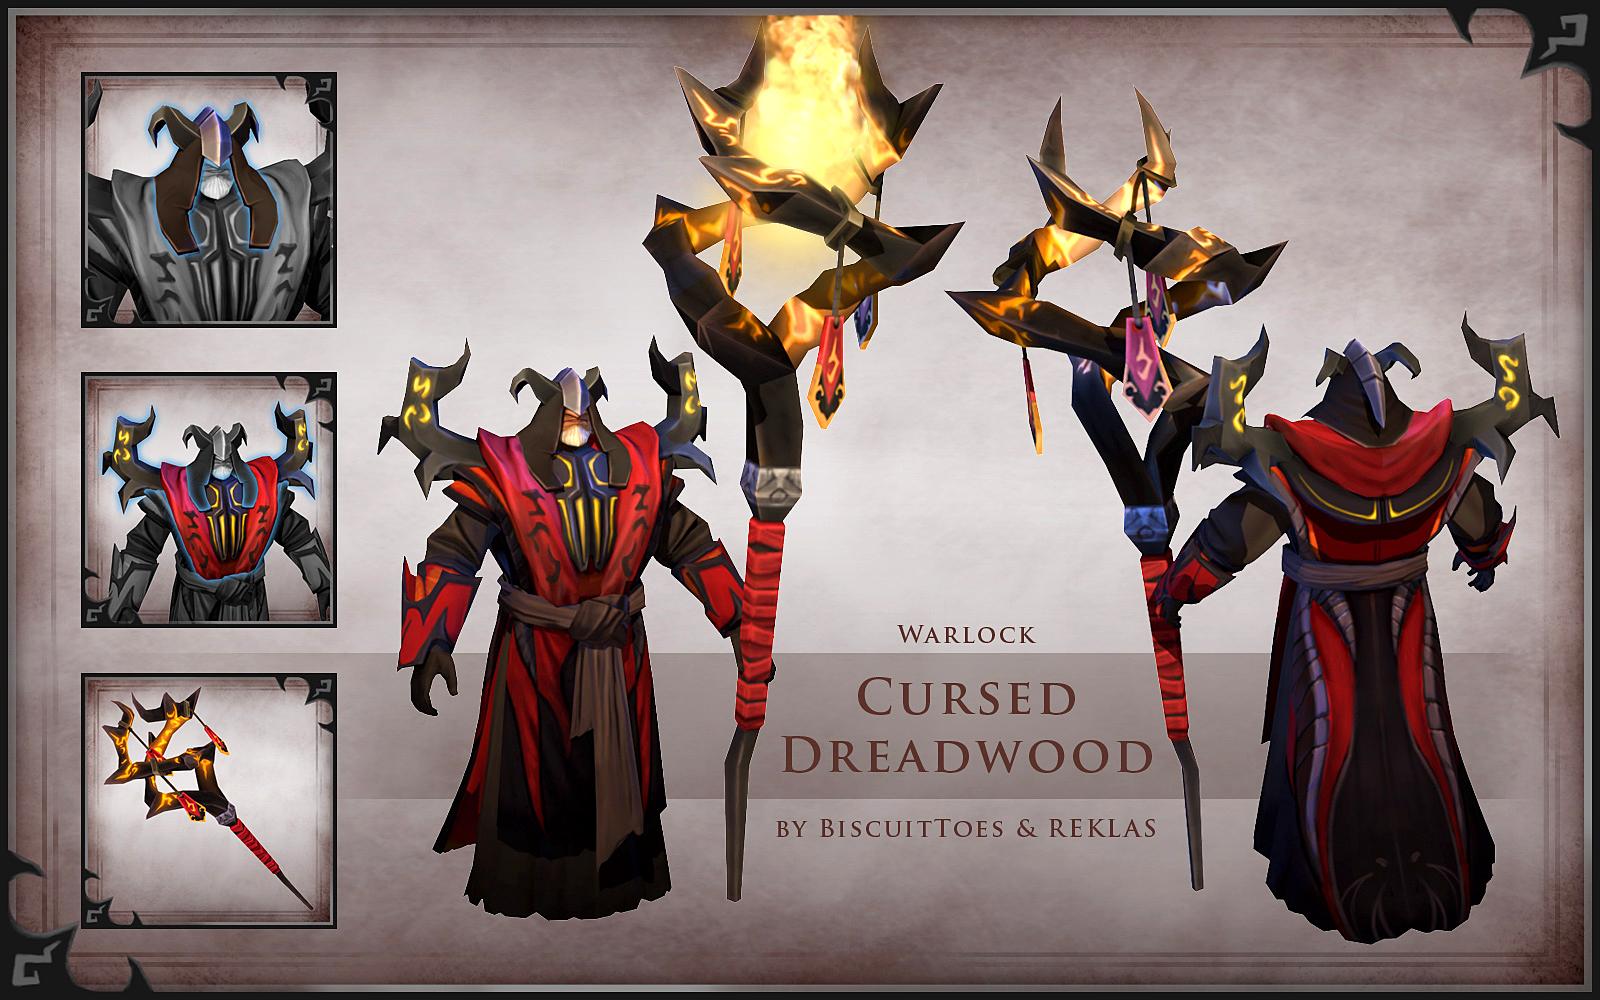 Cursed_Dreadwood_Set_Fire.jpg